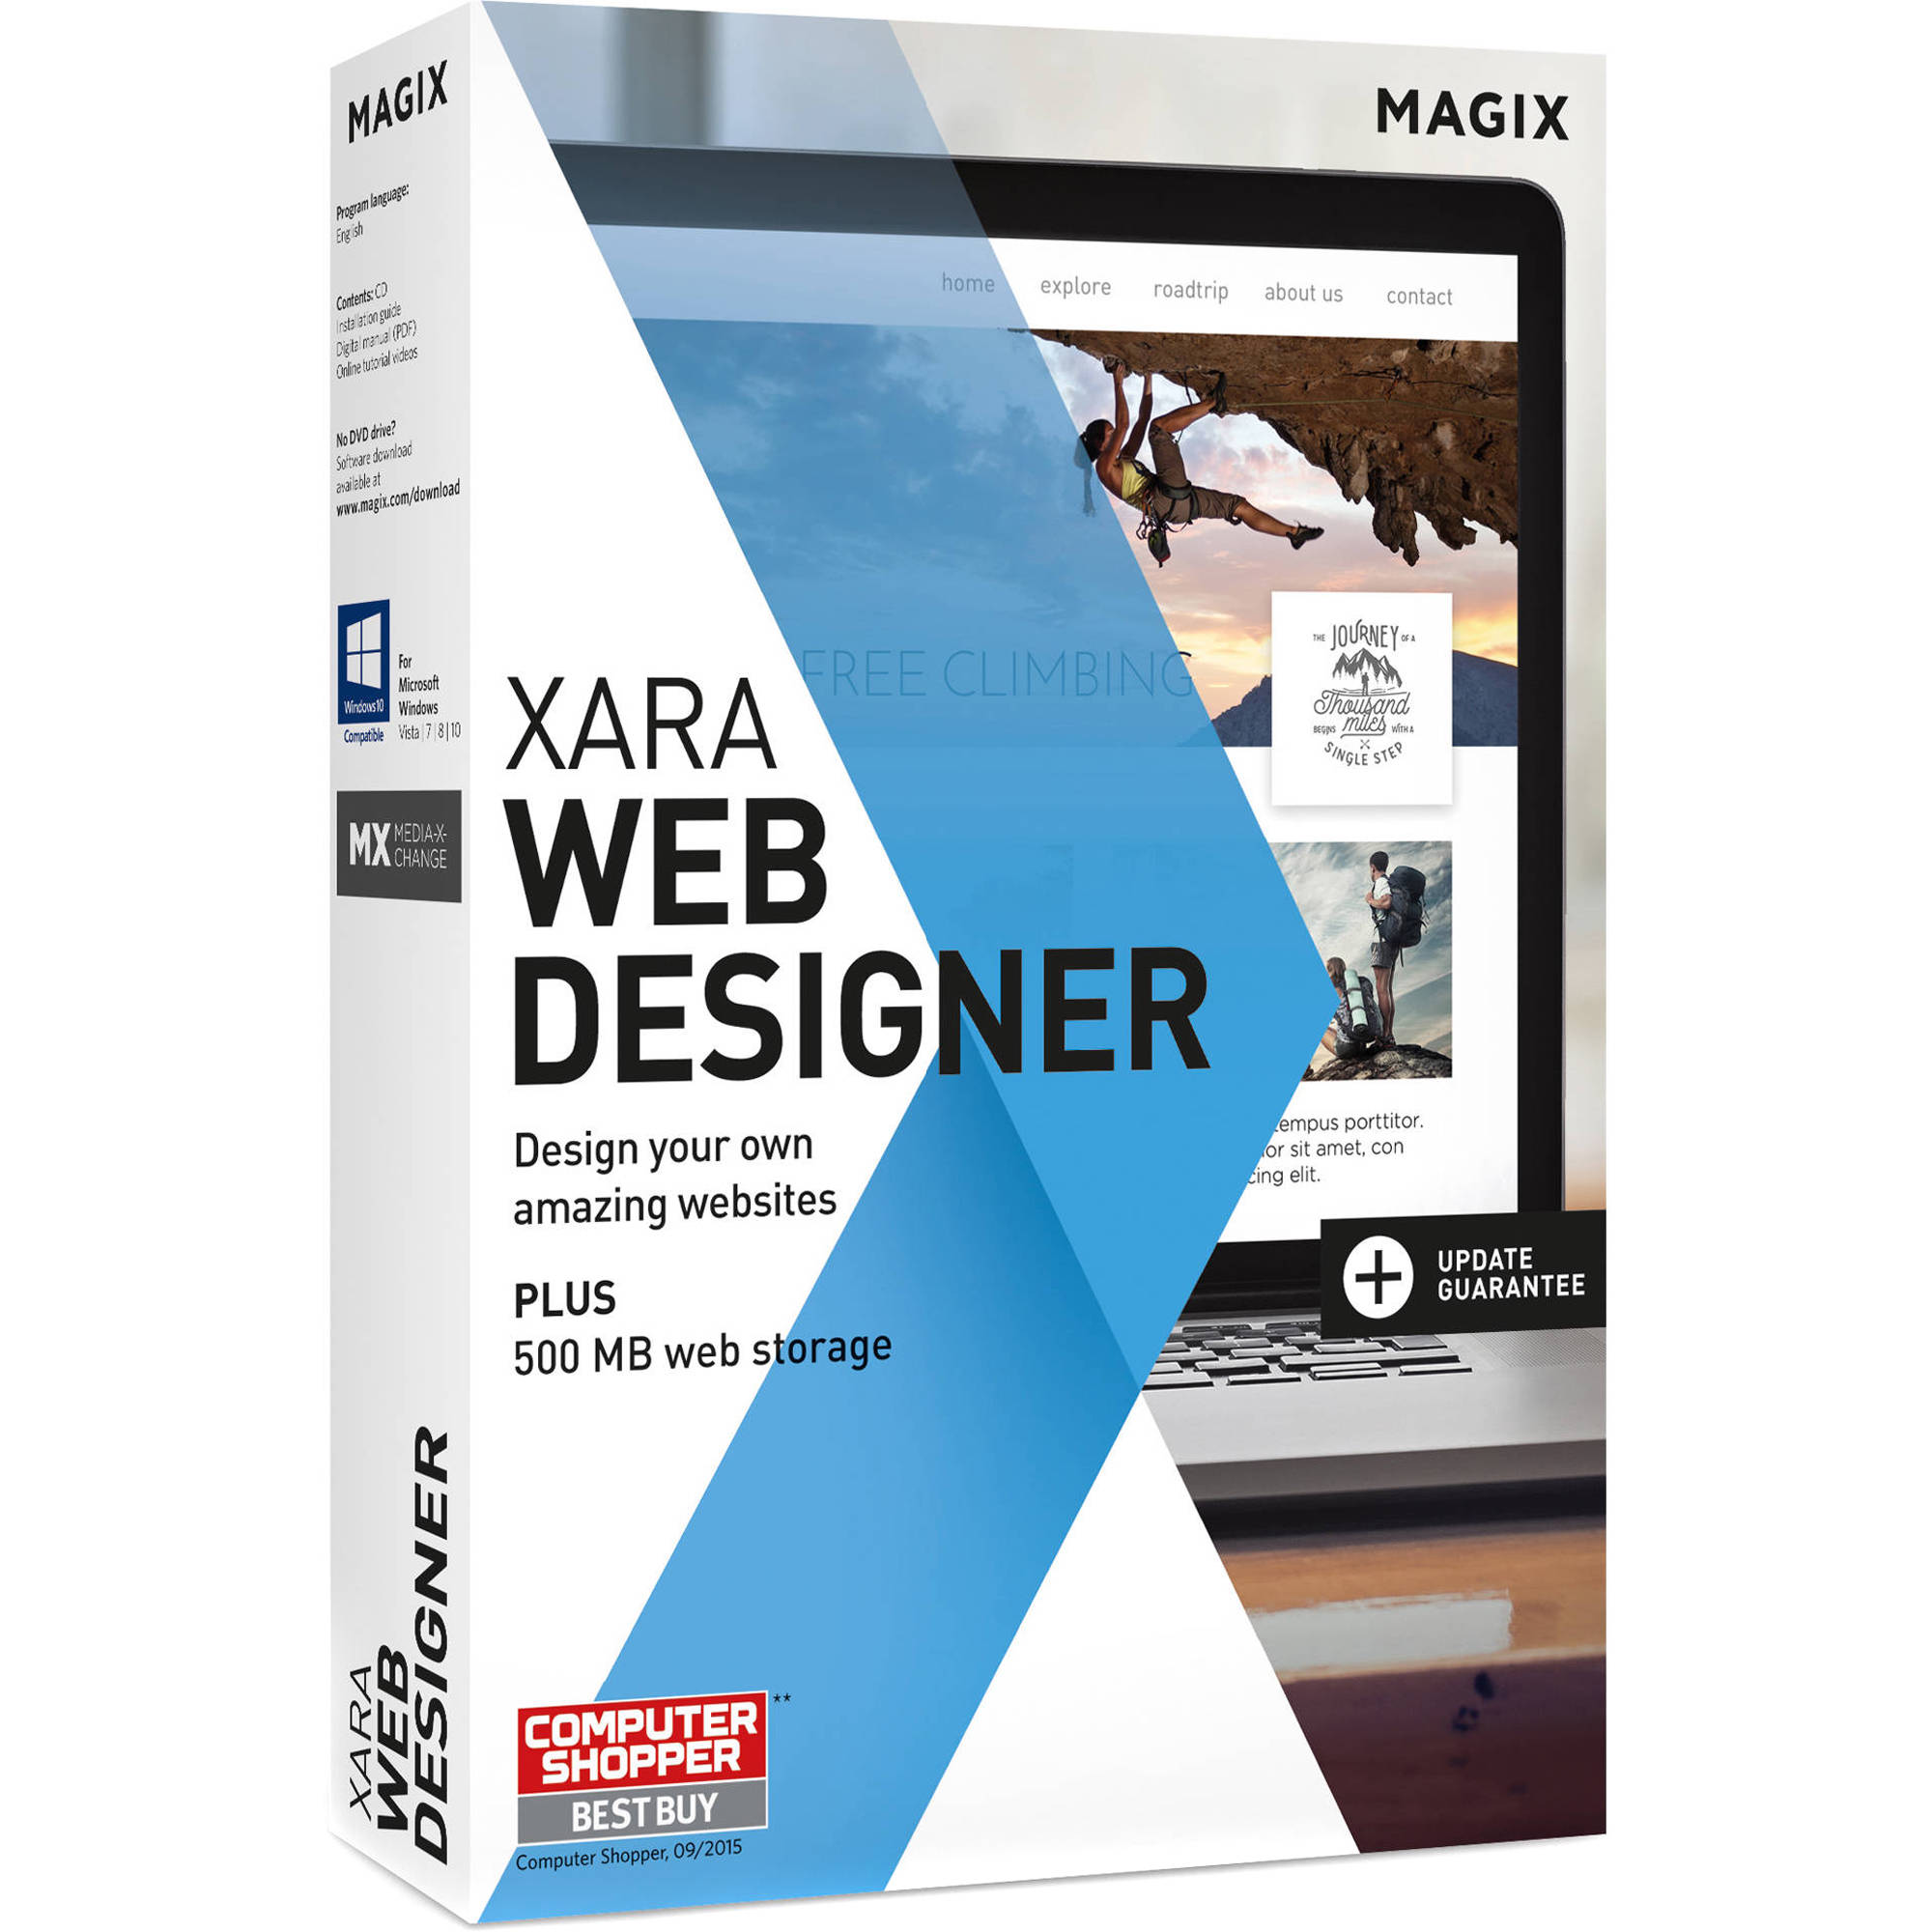 Magix Xara Web Designer Download Anr006410esd B H Photo Video